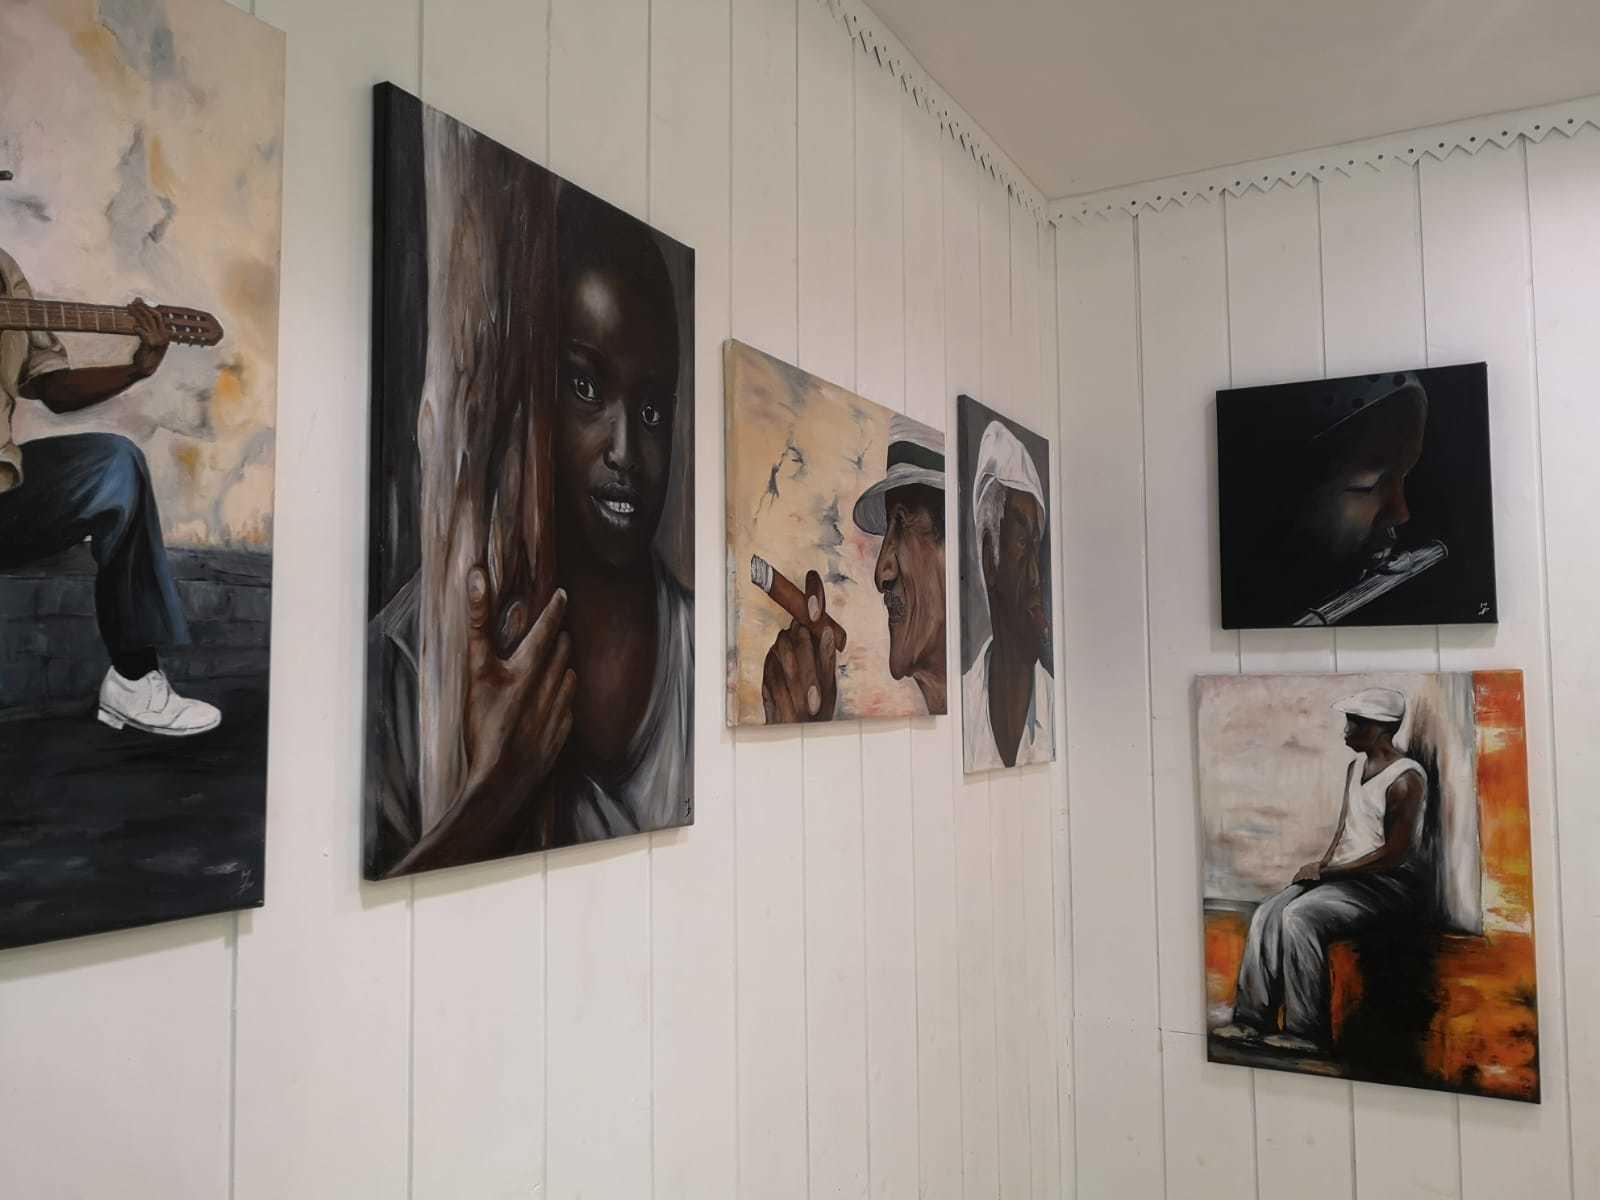 Galerie d'image - Galerie JYGA